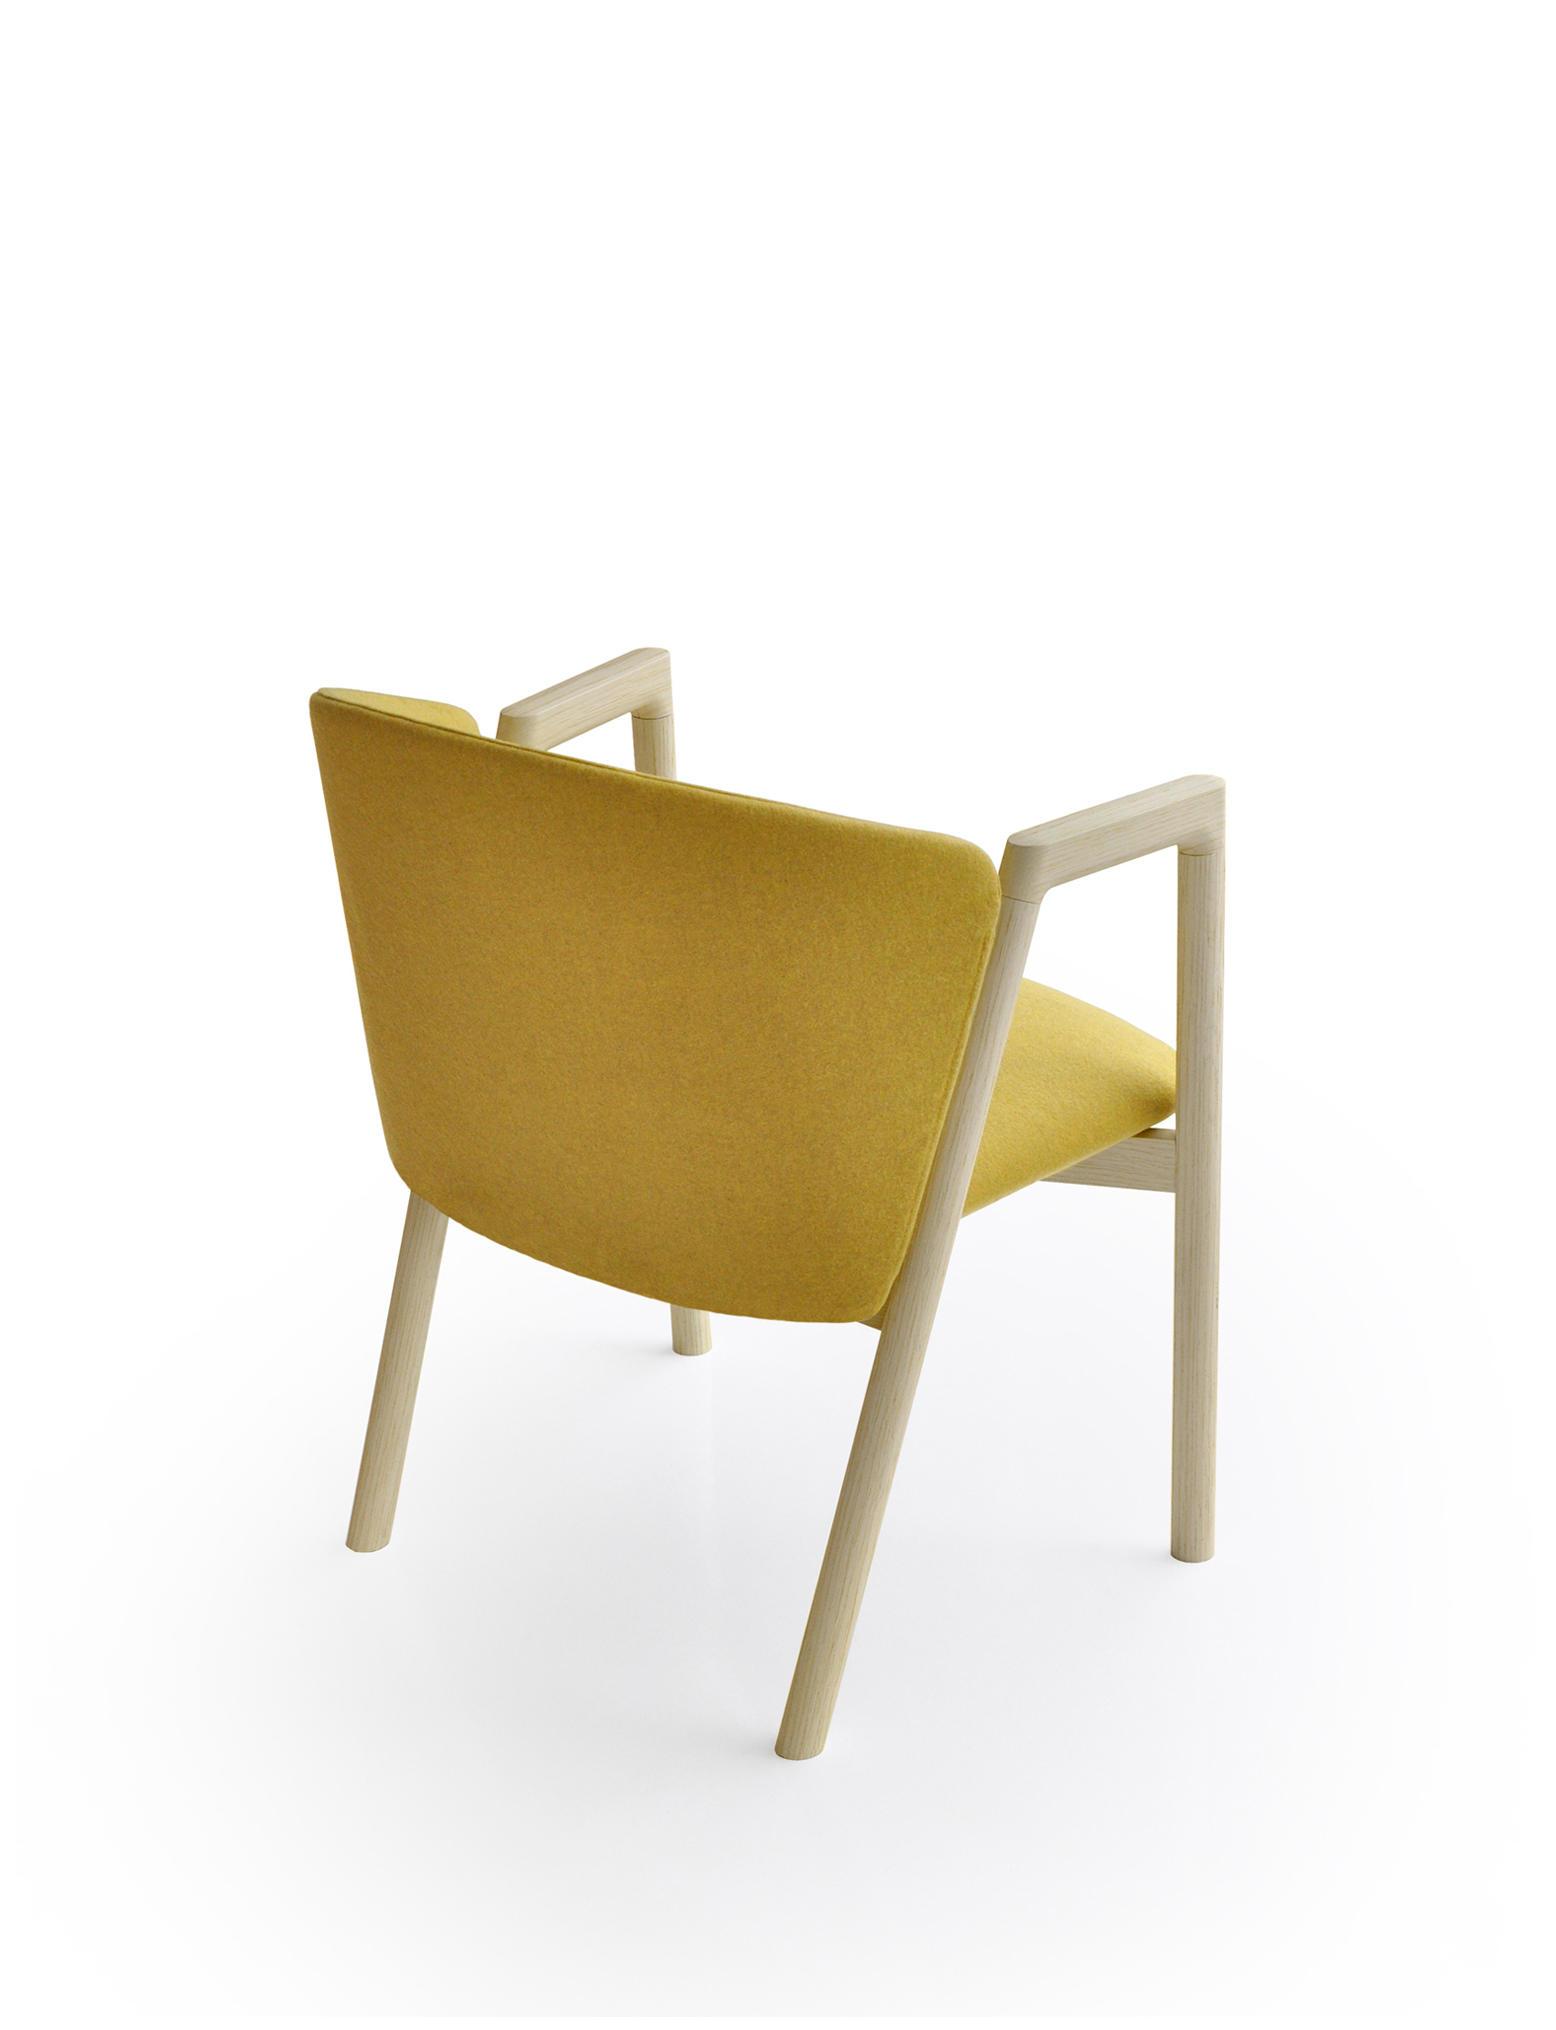 ... Pub Chair By Bensen | Chairs